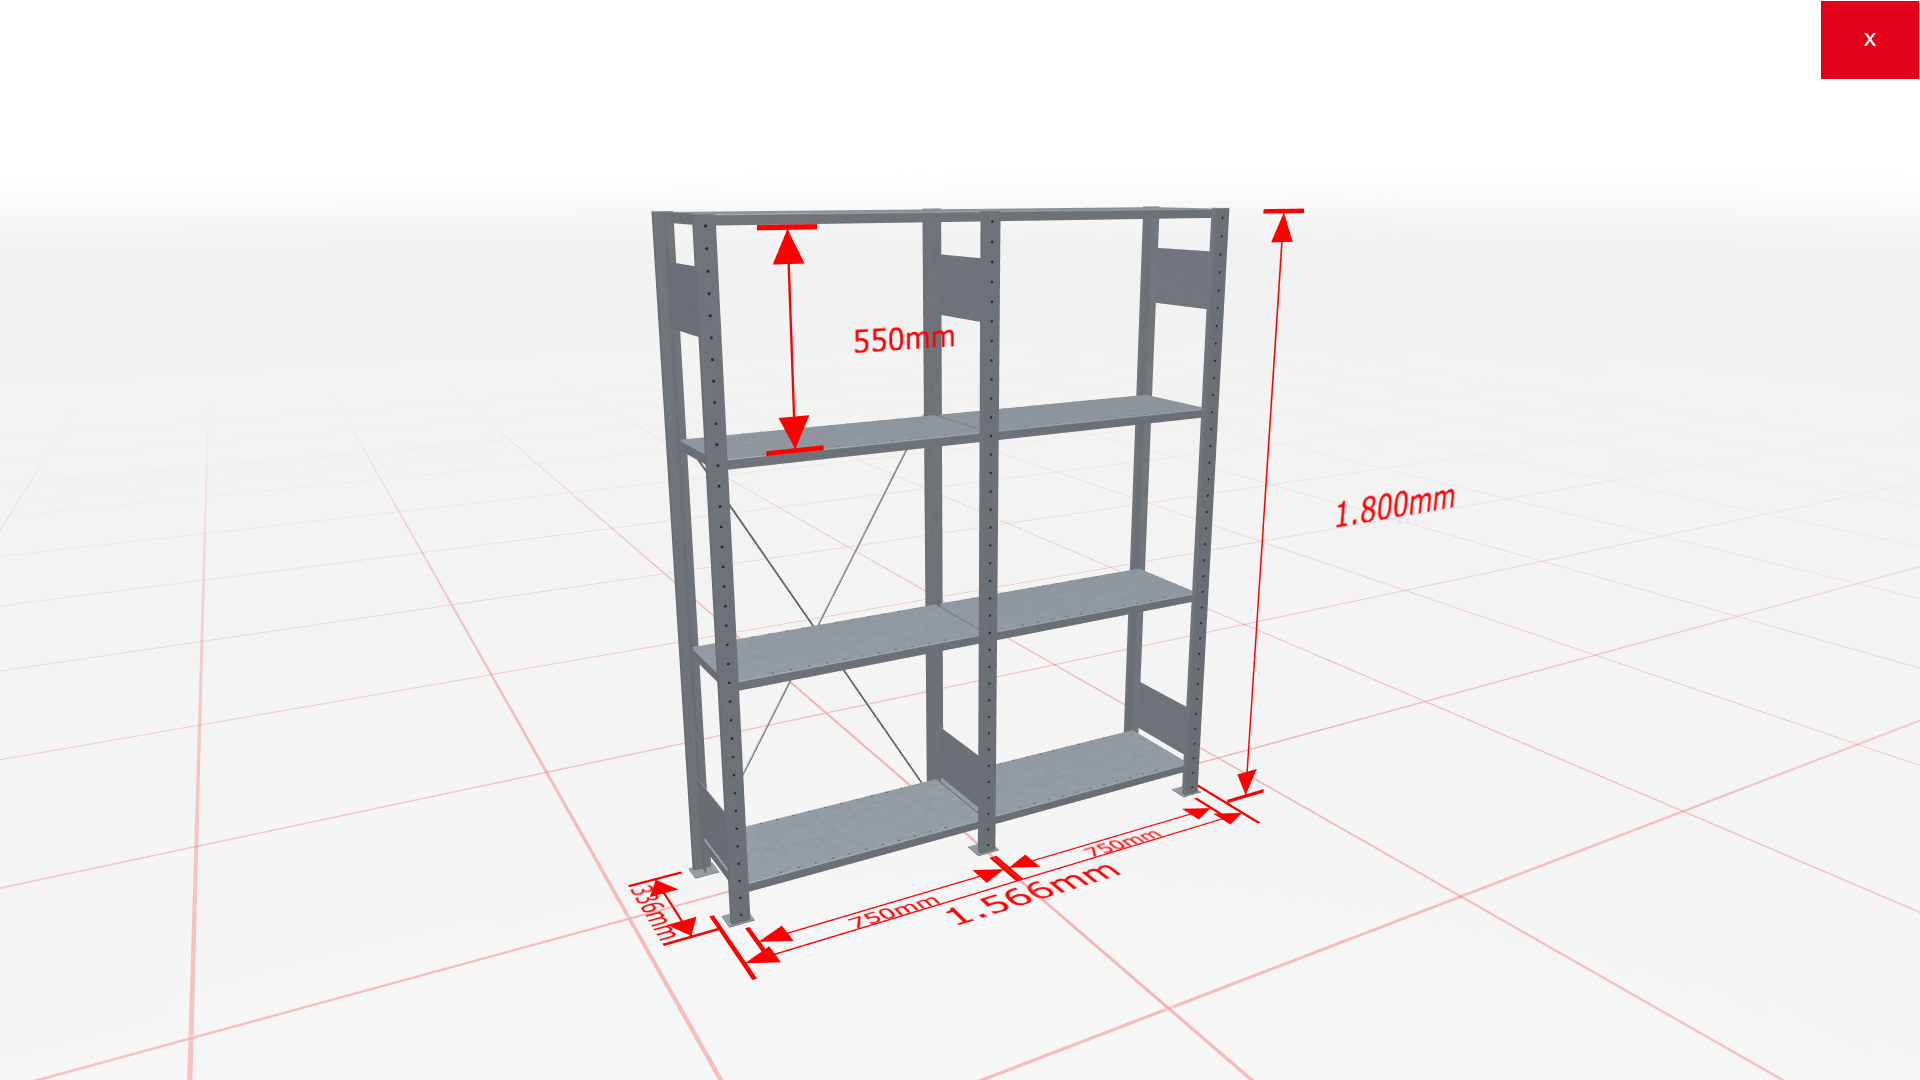 Fachbodenregal Komplettregal 1800x1566x300 mm (HxBxT) SCHULTE Lagertechnik verzinkt 4 Ebenen  150 kg je Boden